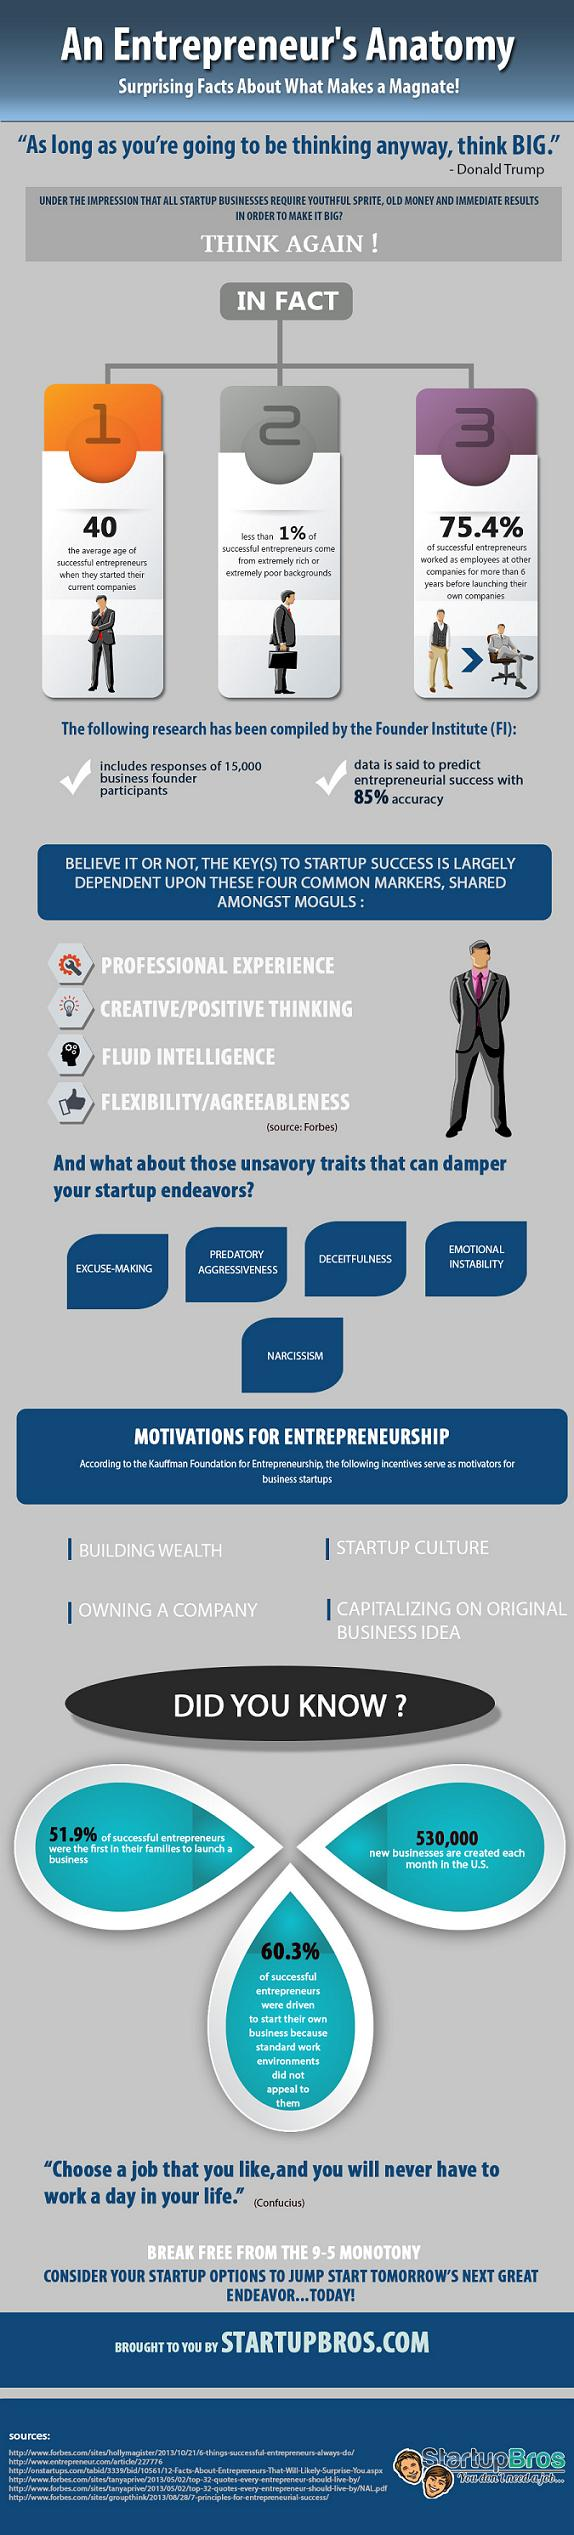 an-entrepreneurs-anatomy_52884b74aed88